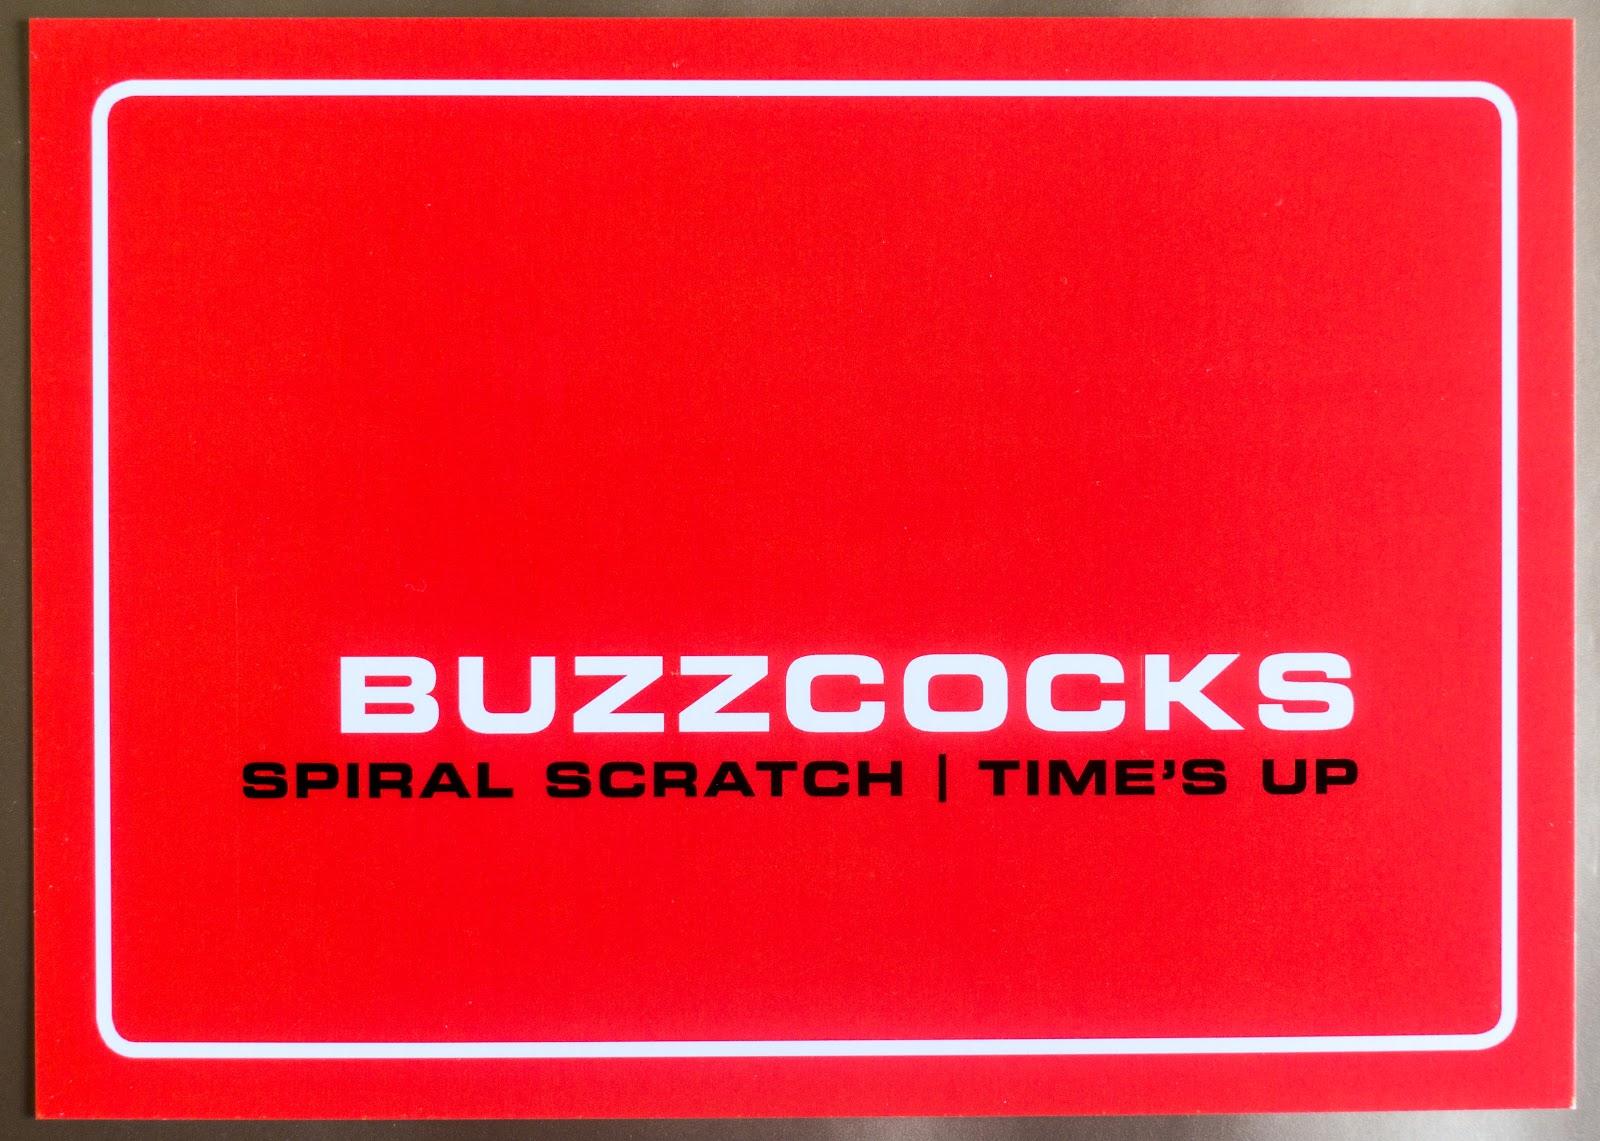 Feed The Enemy Buzzcocks 40 Year Anniversary Box Set